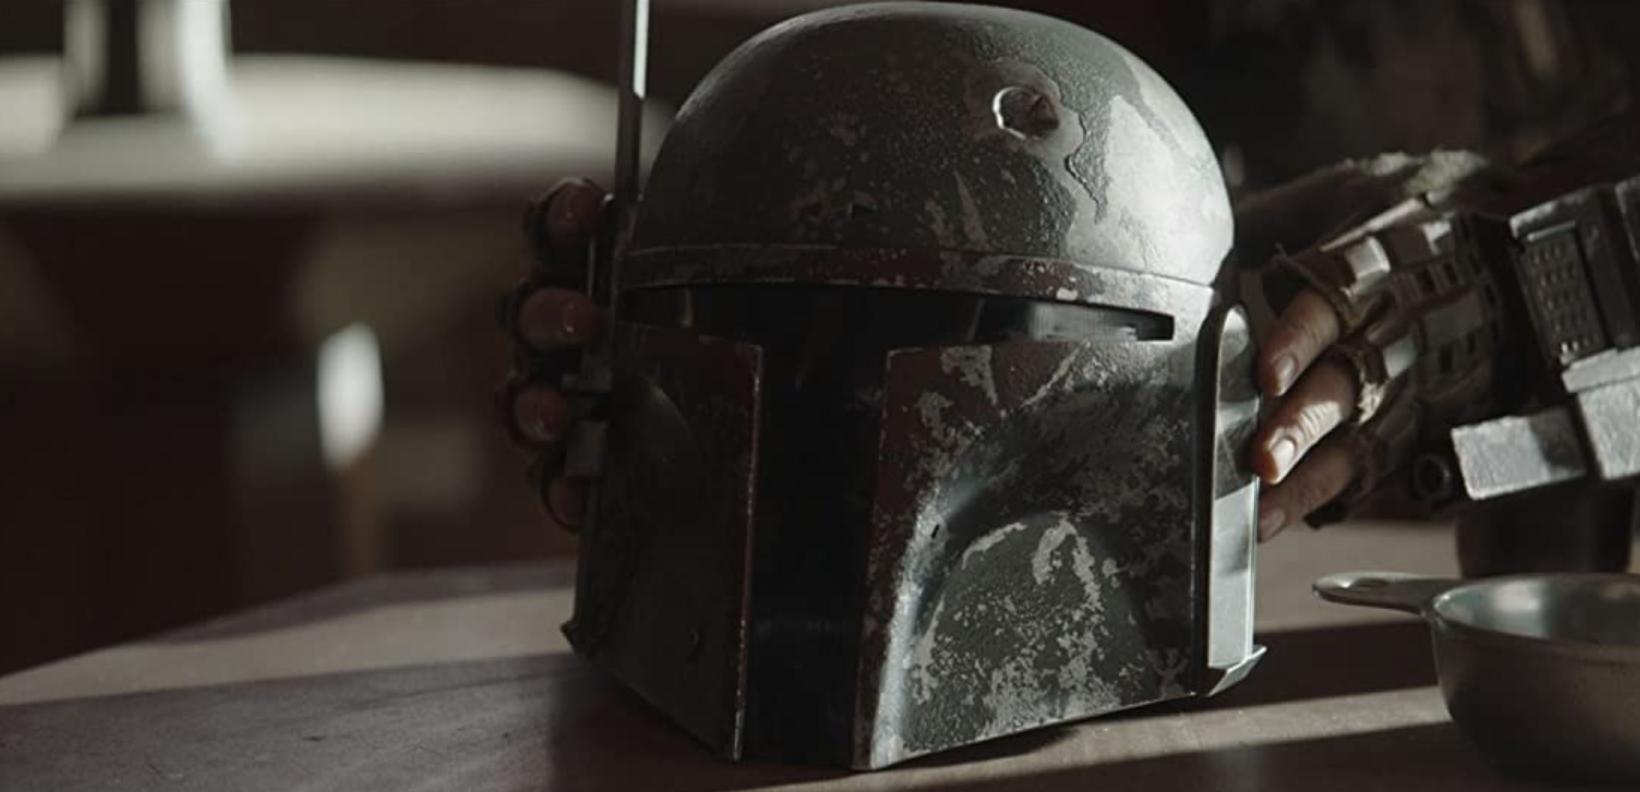 Сериал Мандалорец, 2 сезон 1 серия шлем Мандалорца